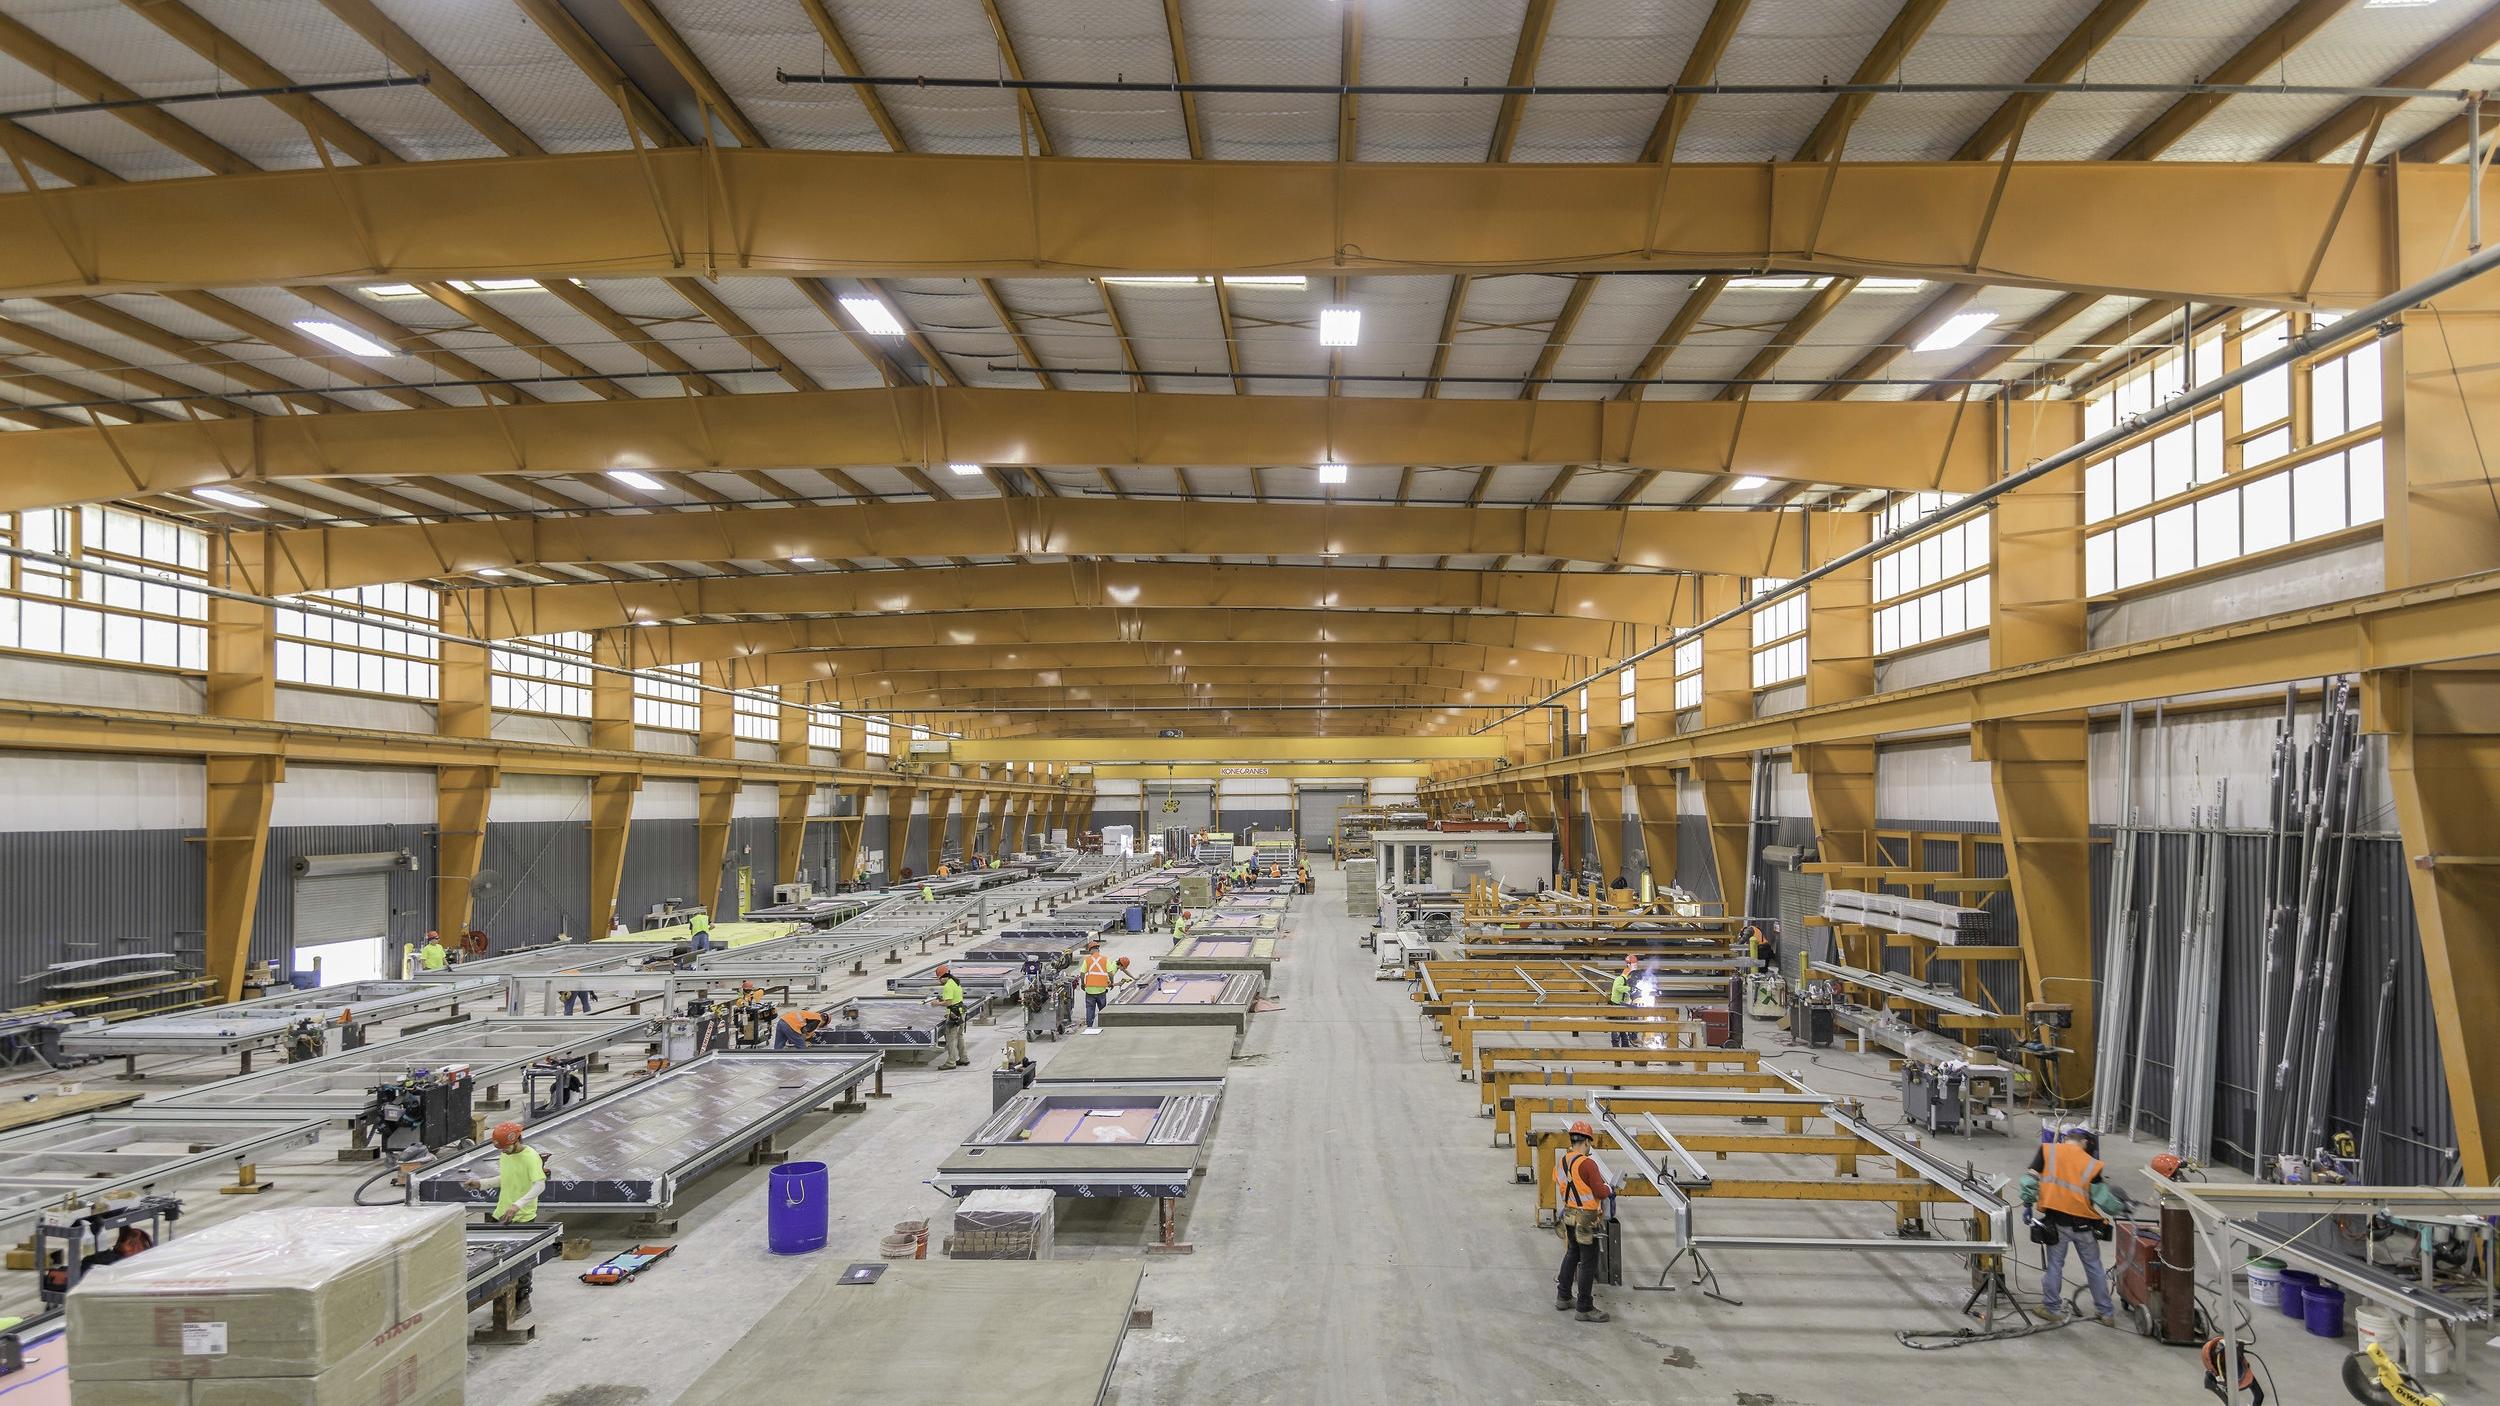 Megapanel fabrication facilities.